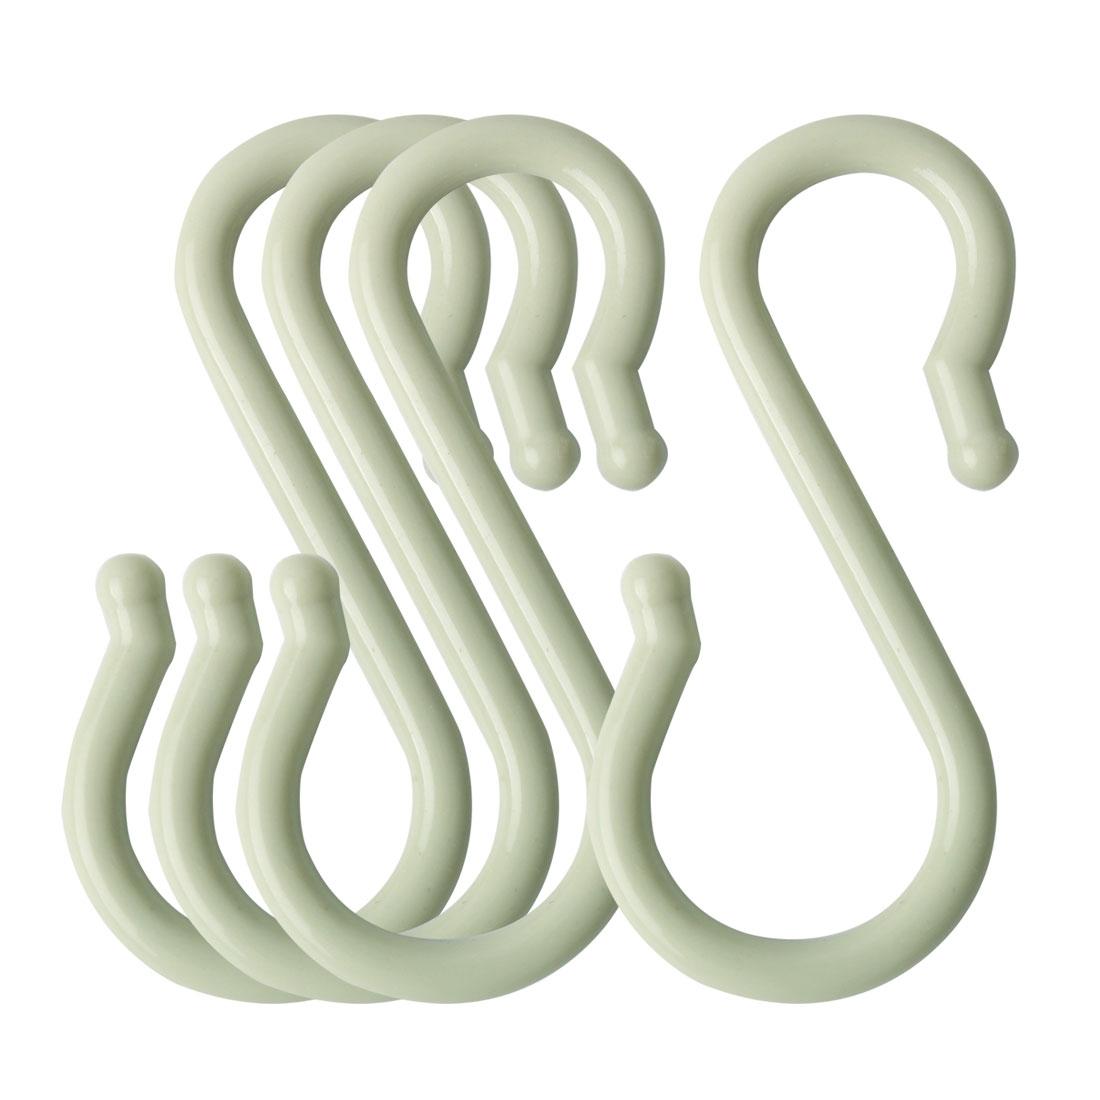 4 Pack S Hook Plastic for Kitchen Pots Utensils Coat Towel Hanging Light Green